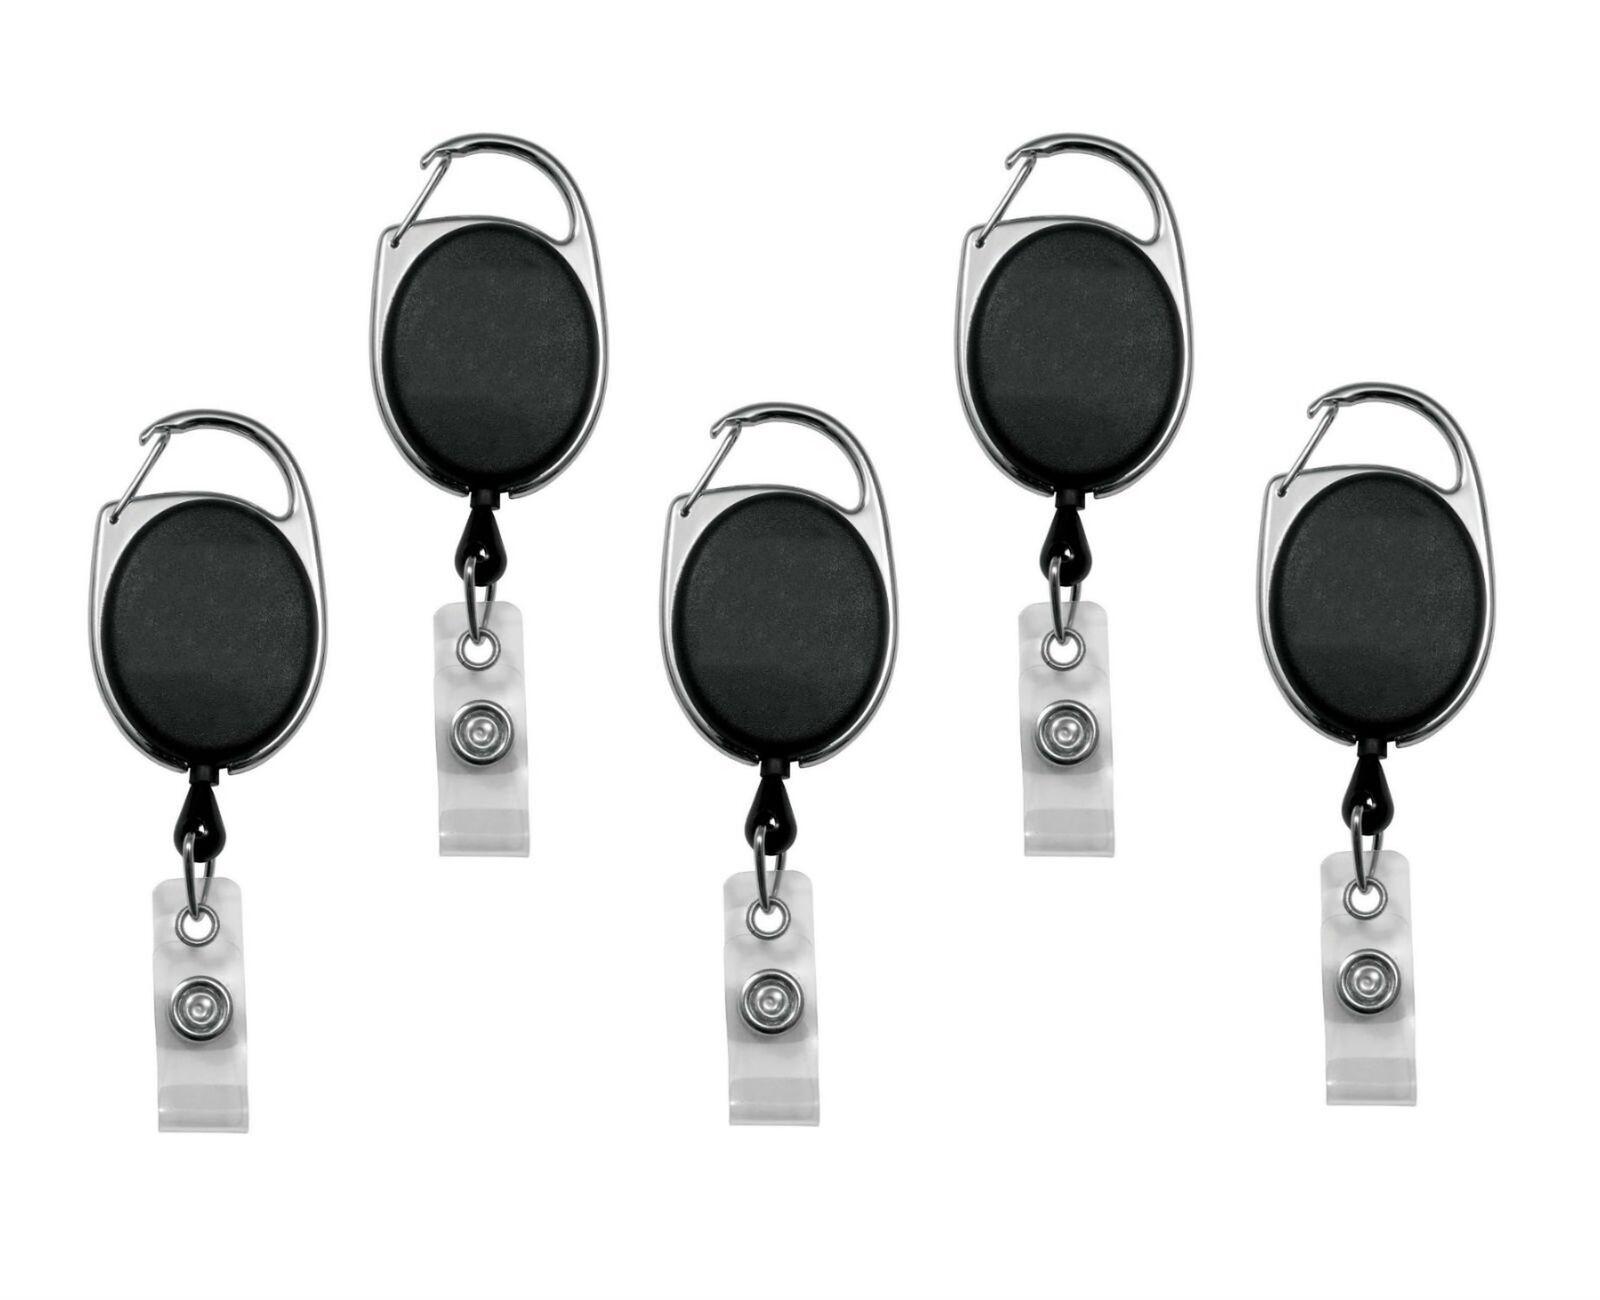 WZYuan 9pcs Reel Retractable Key Clip Holders Office ID Badges Card Holder